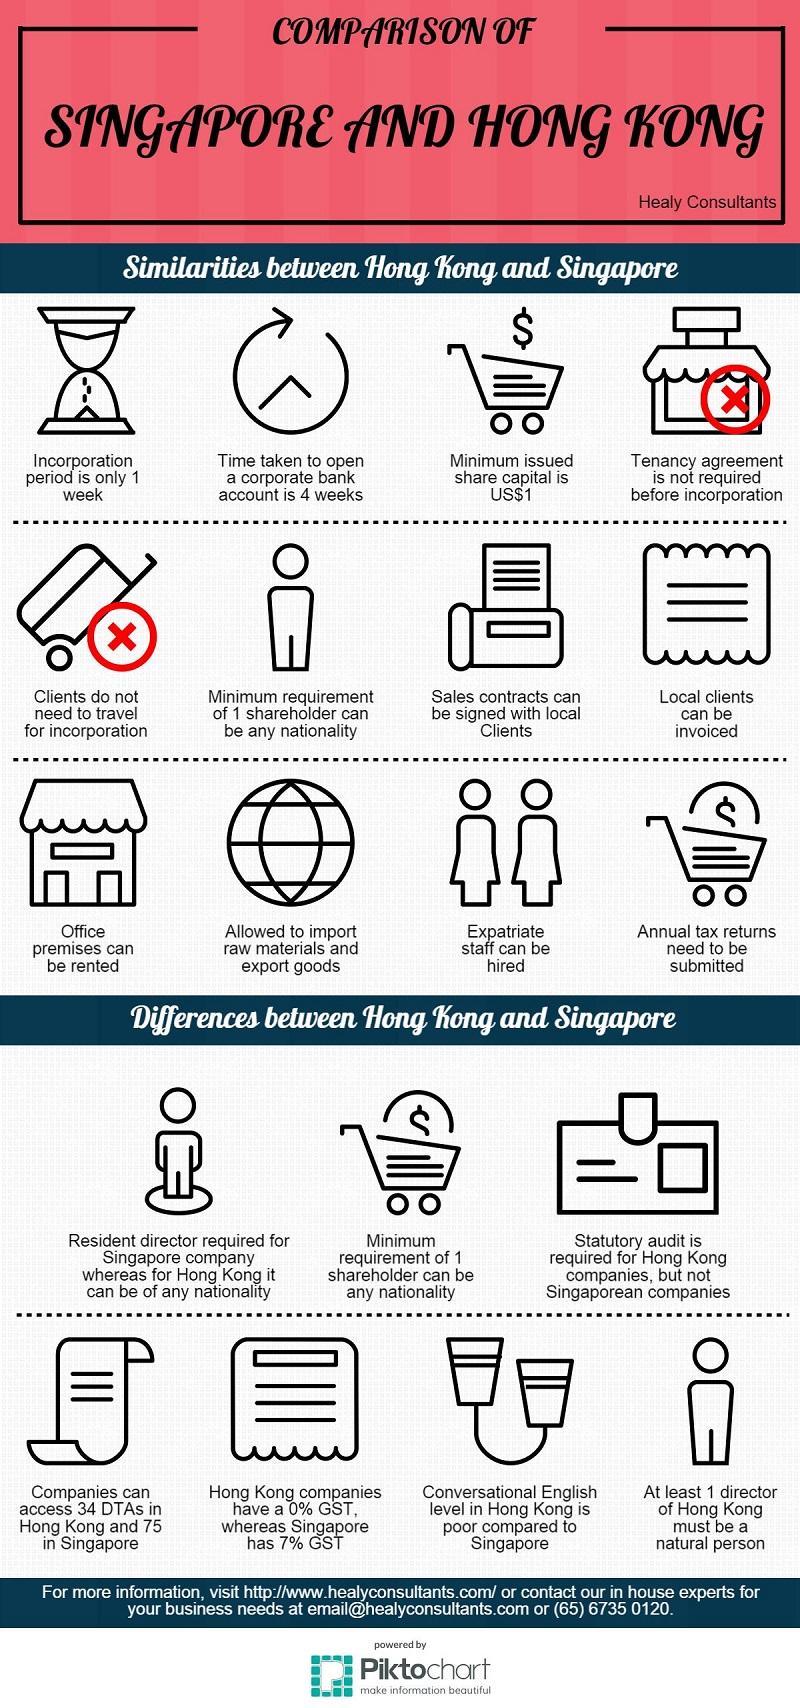 Similarities and differences between Hong Kong and Singapore